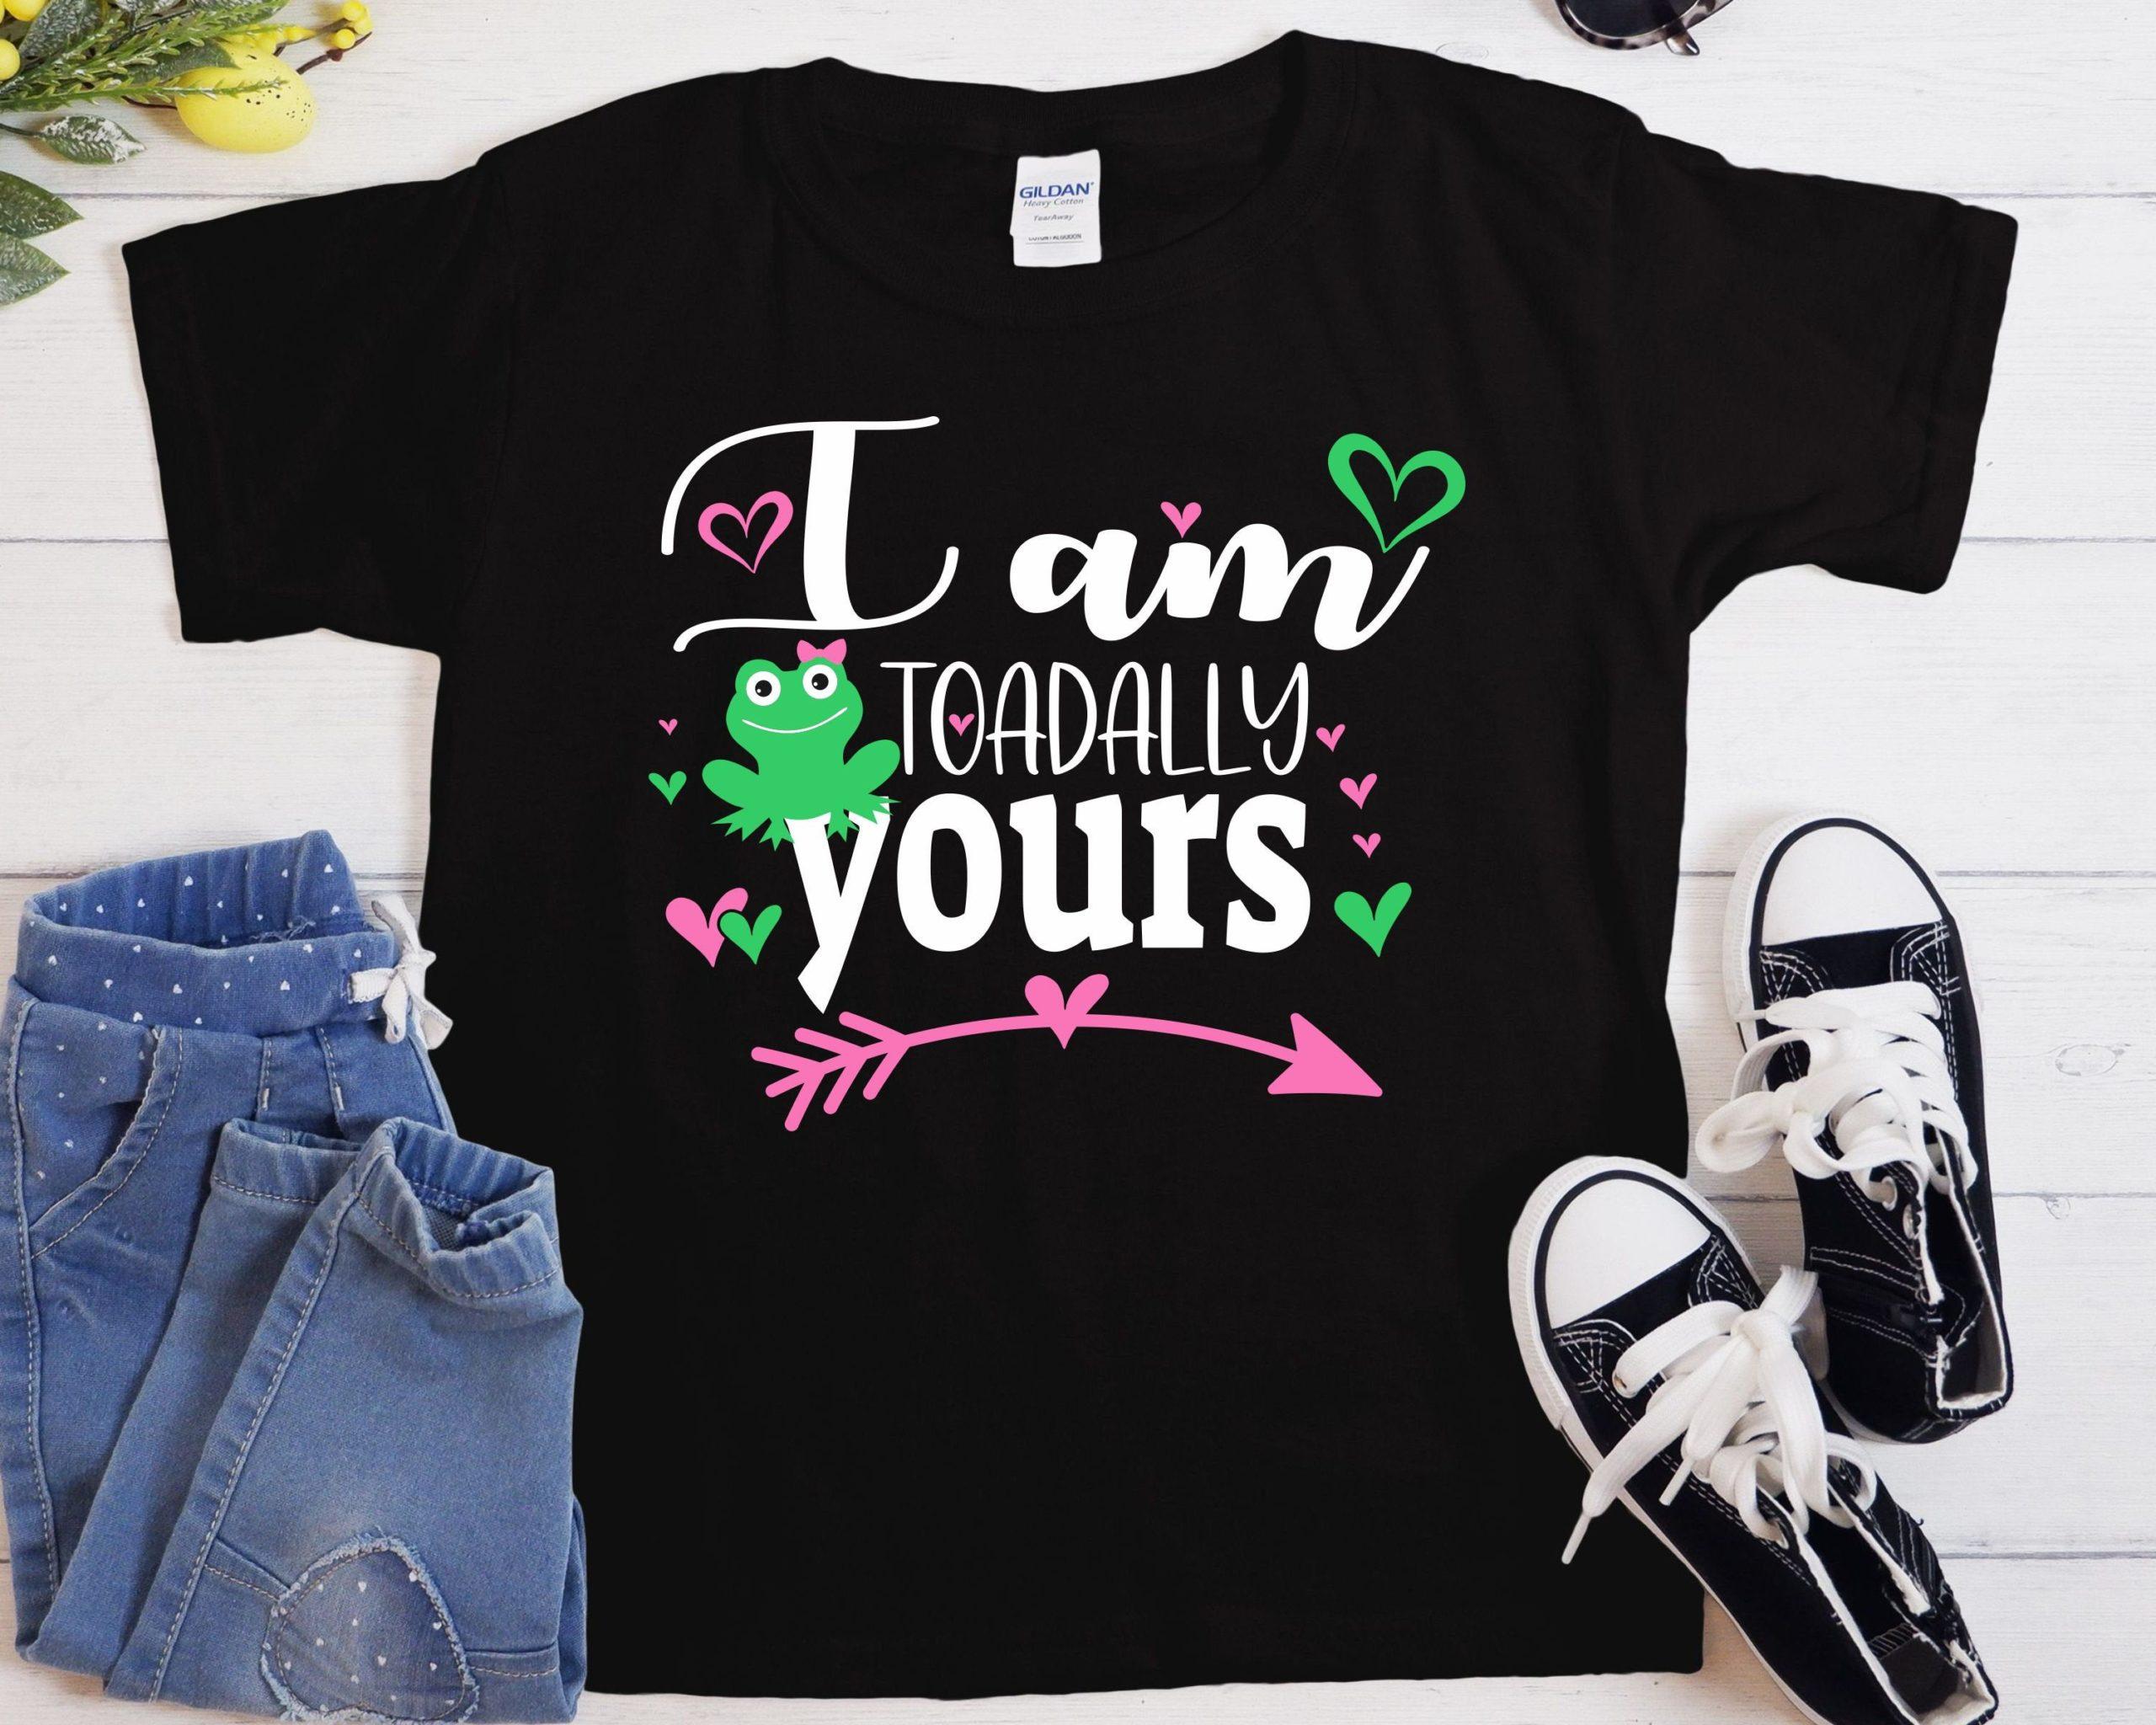 Im-toadally-yours-svg-kids-valentine-svg-totally-yours-svg-valentines-day-svg-valentine-svg-designs-cricut-valentines-day-svg-600a033d